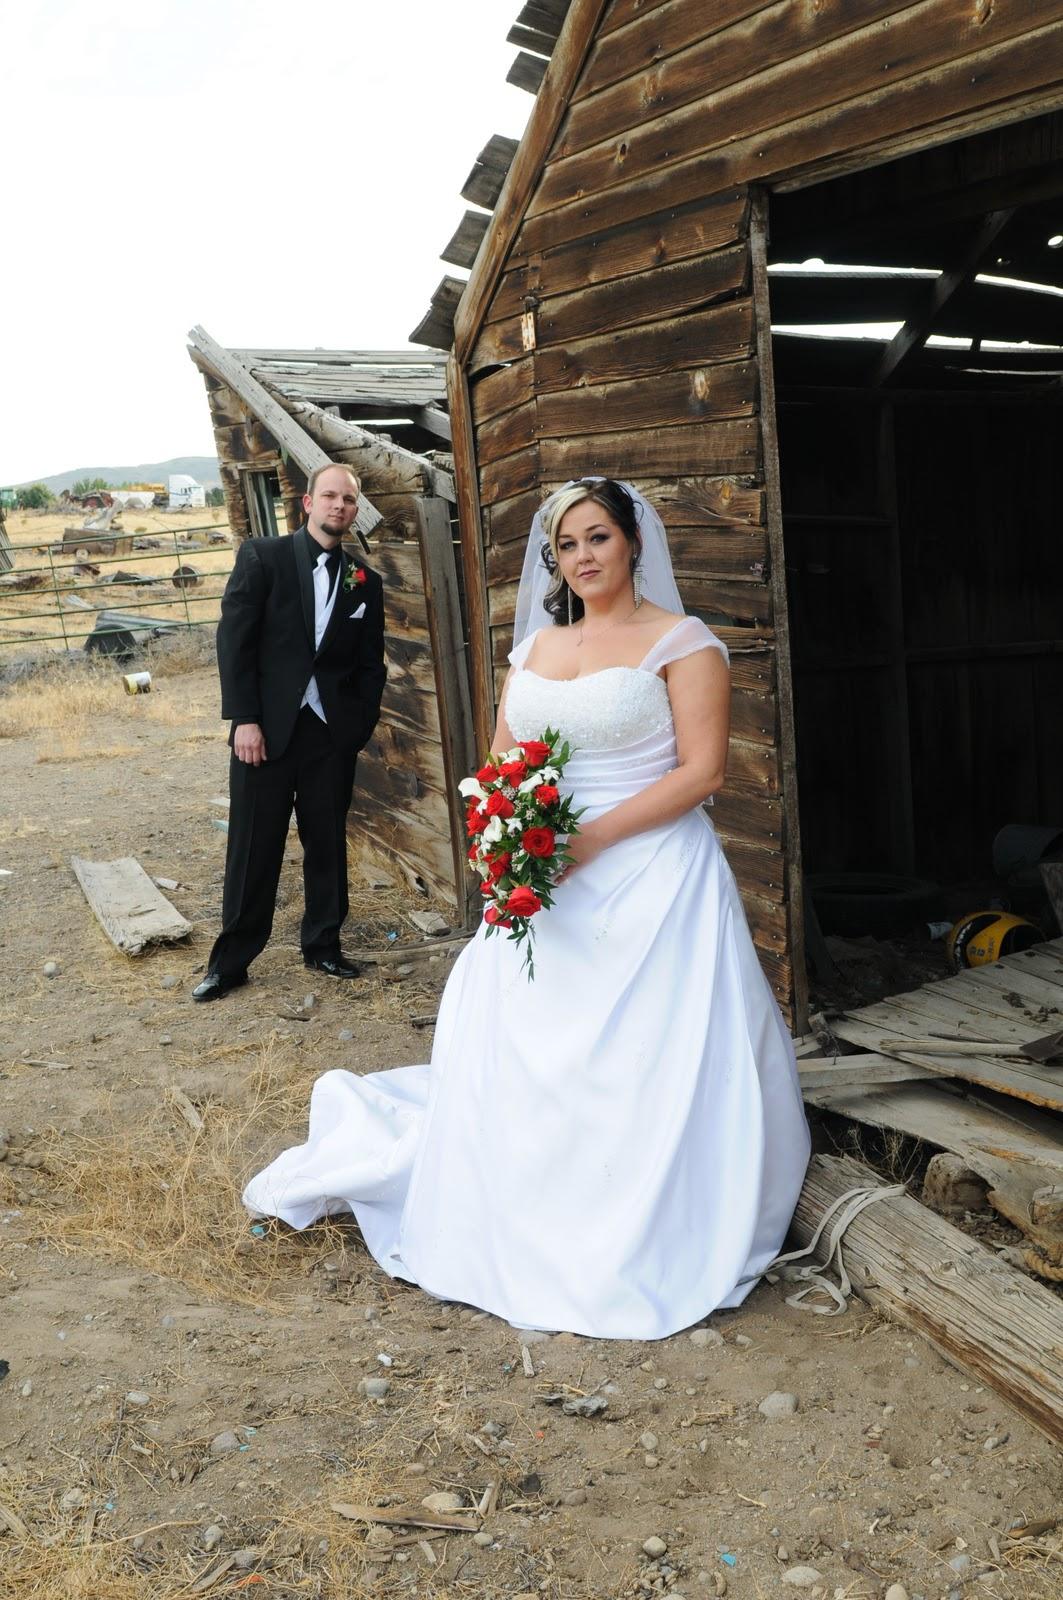 Wedding Photography Reno: Zinser Photography: The Grove, Reno NV {Reno, NV Wedding